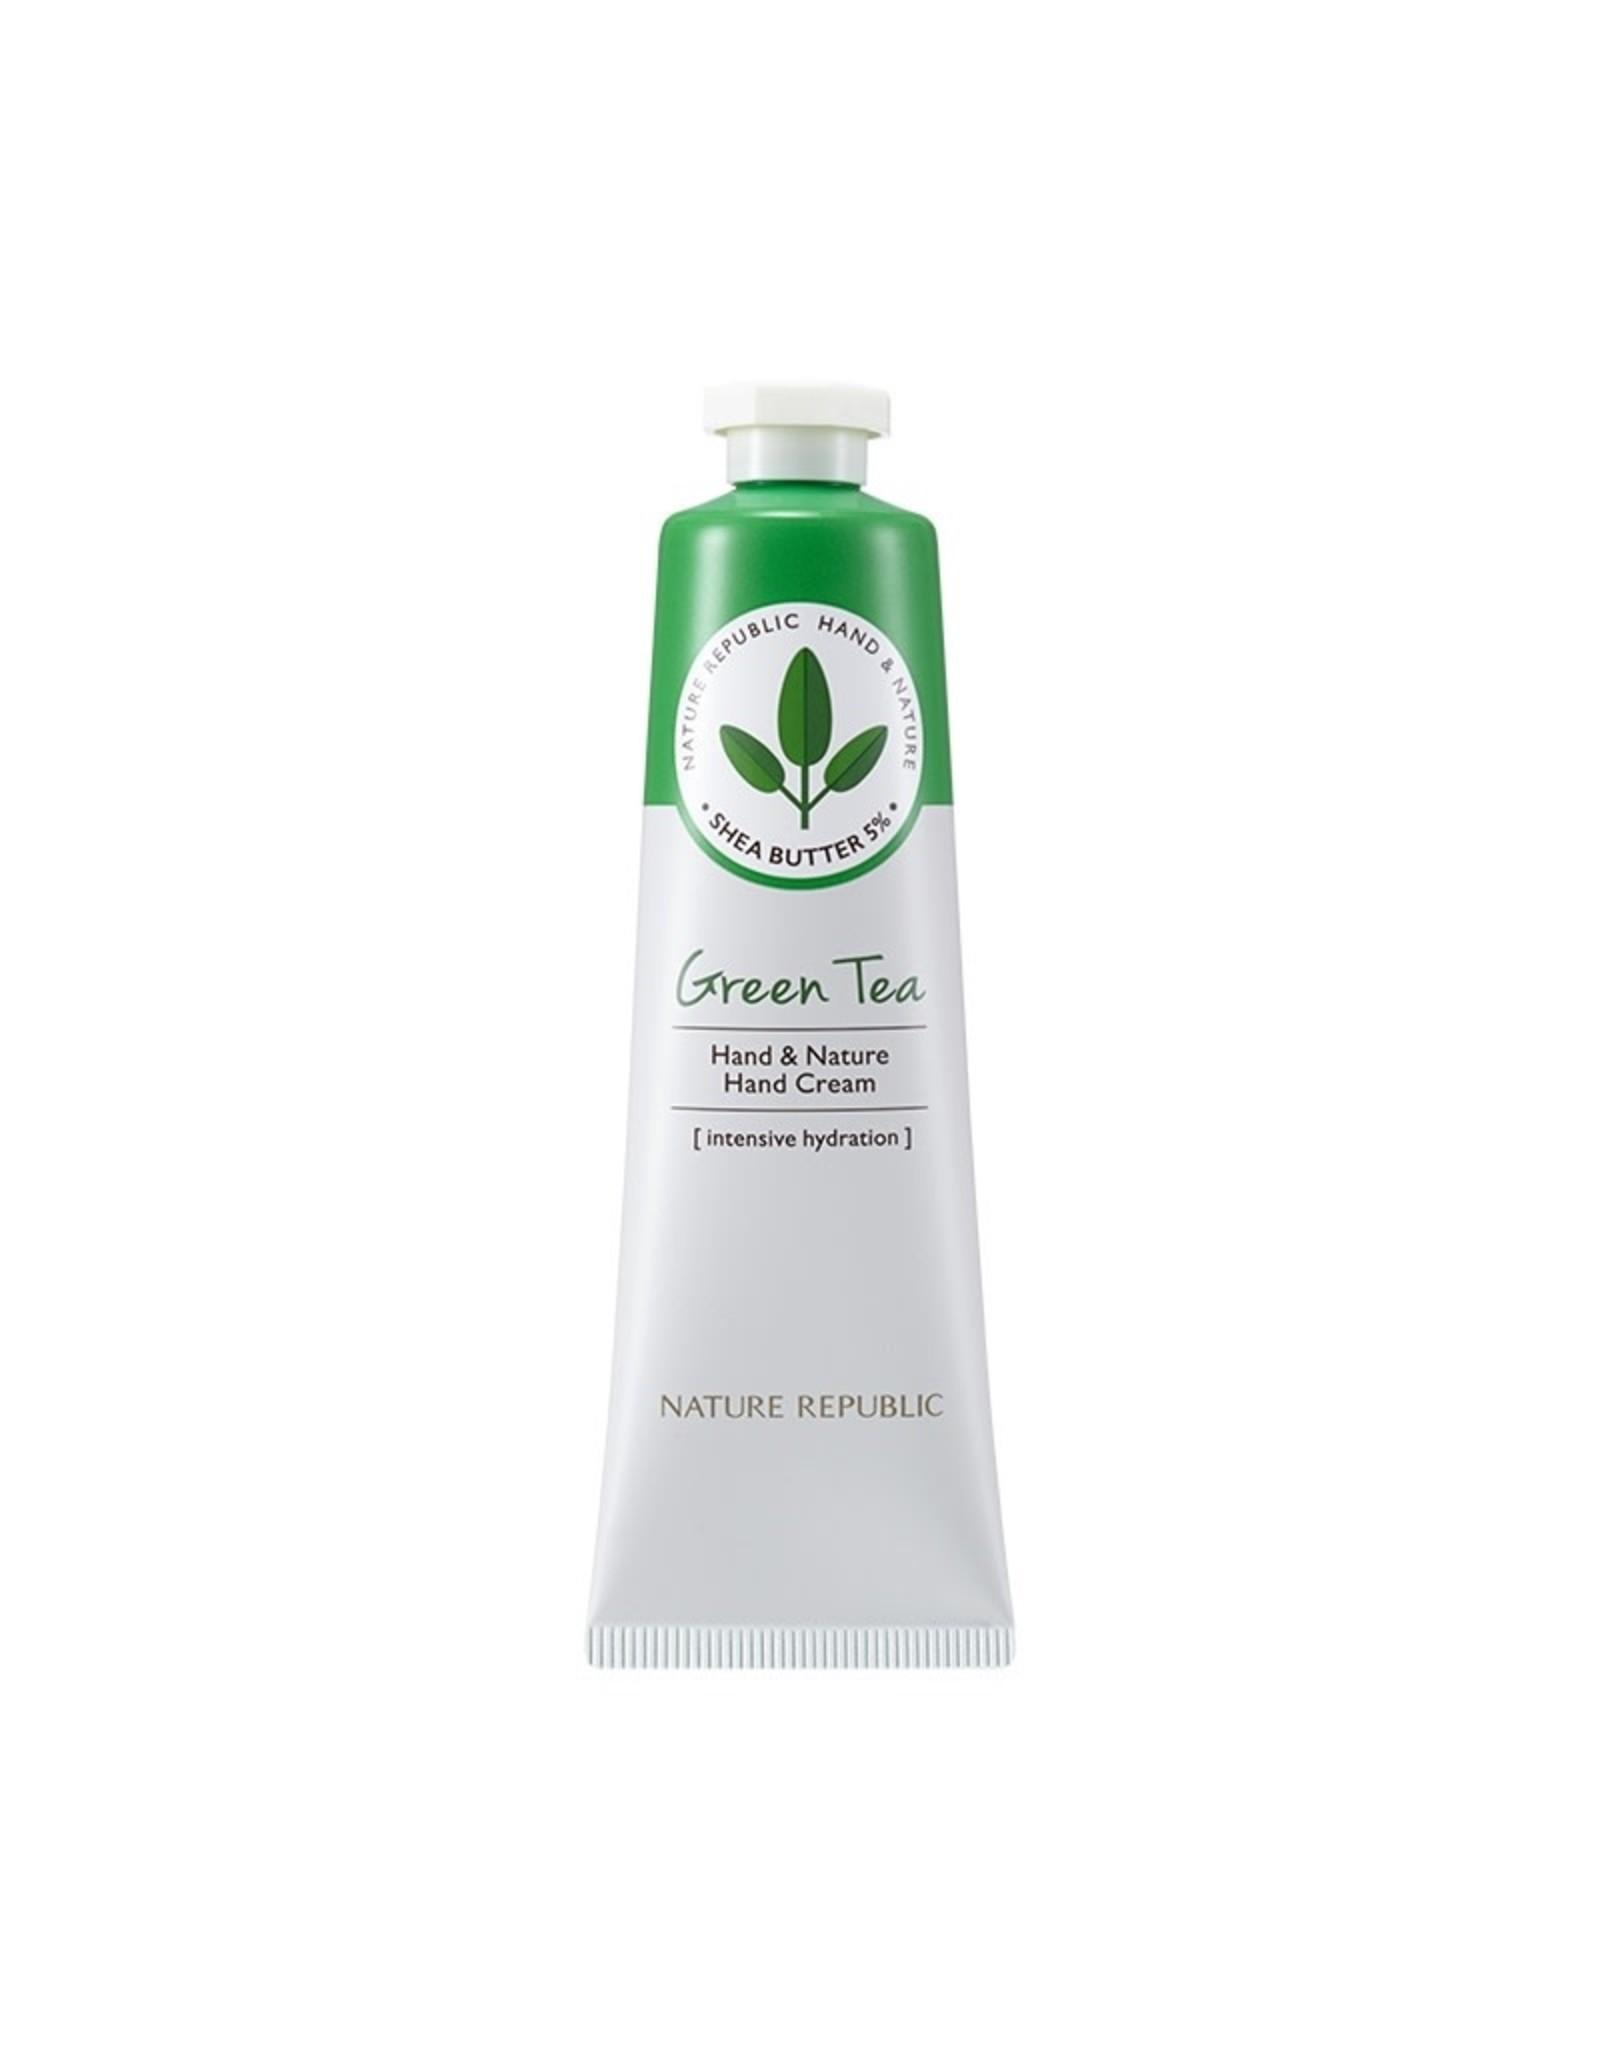 Hand & Nature Hand Cream Green Tea (Orig $8.90)